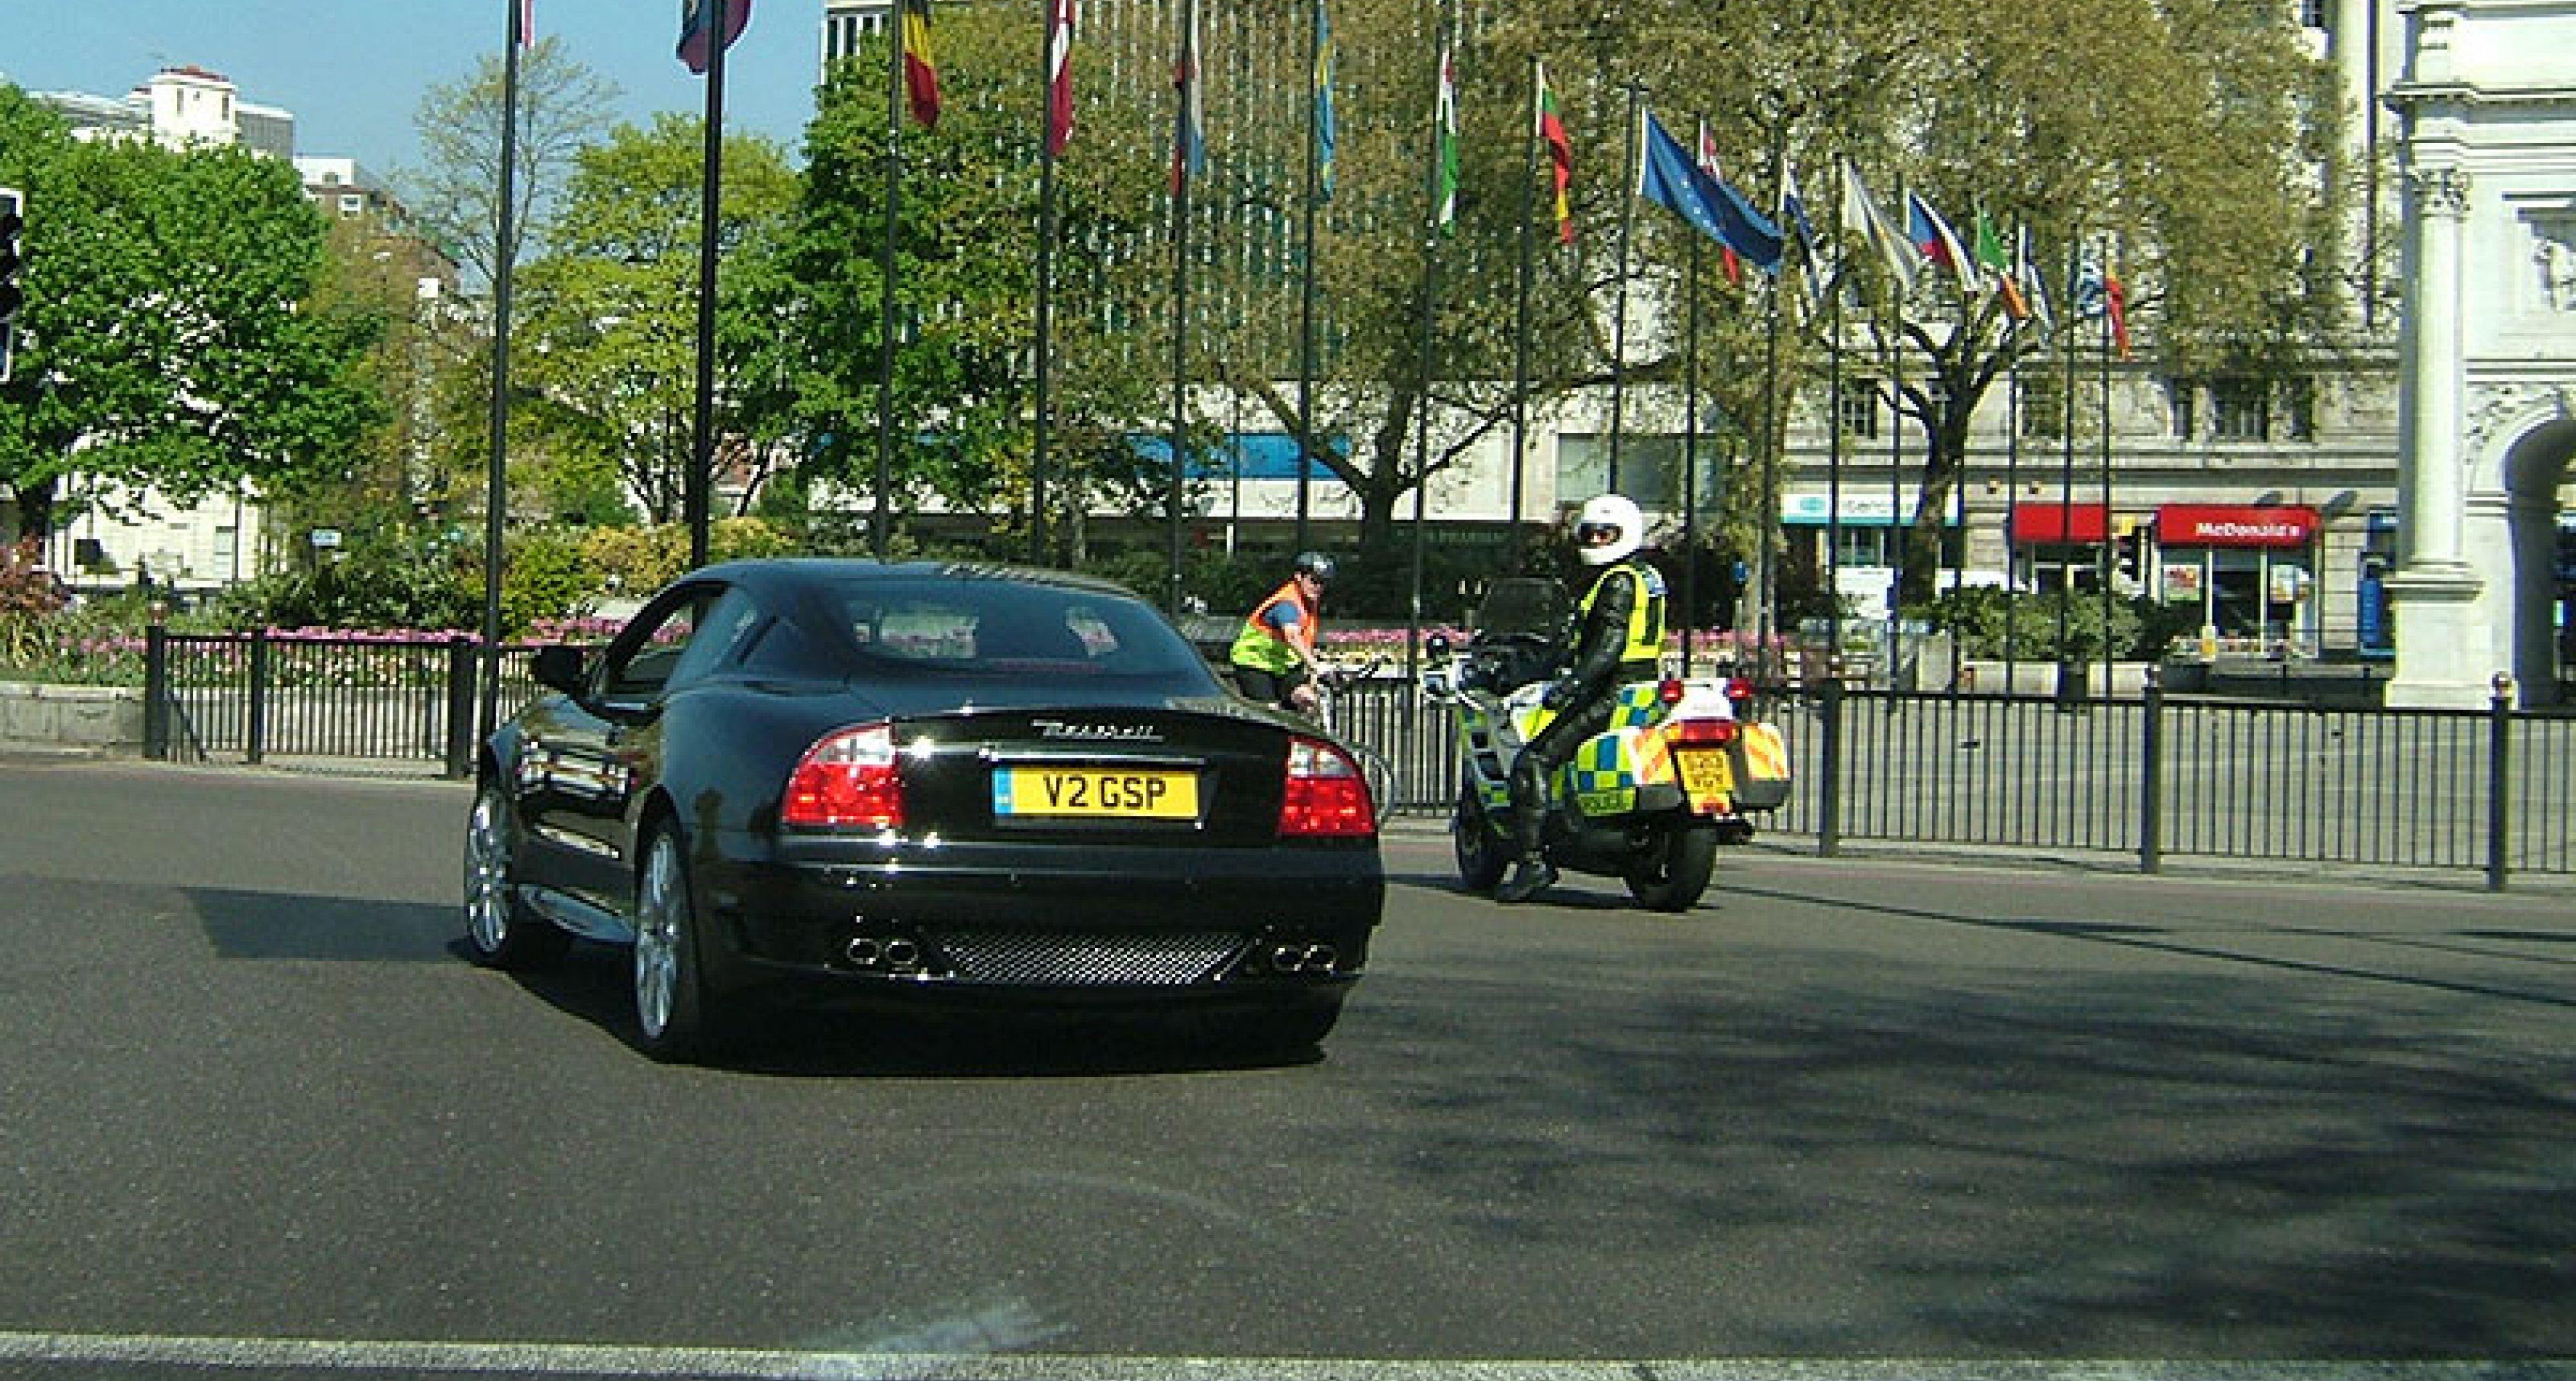 Quattroporte on the Supercar Tour 2006